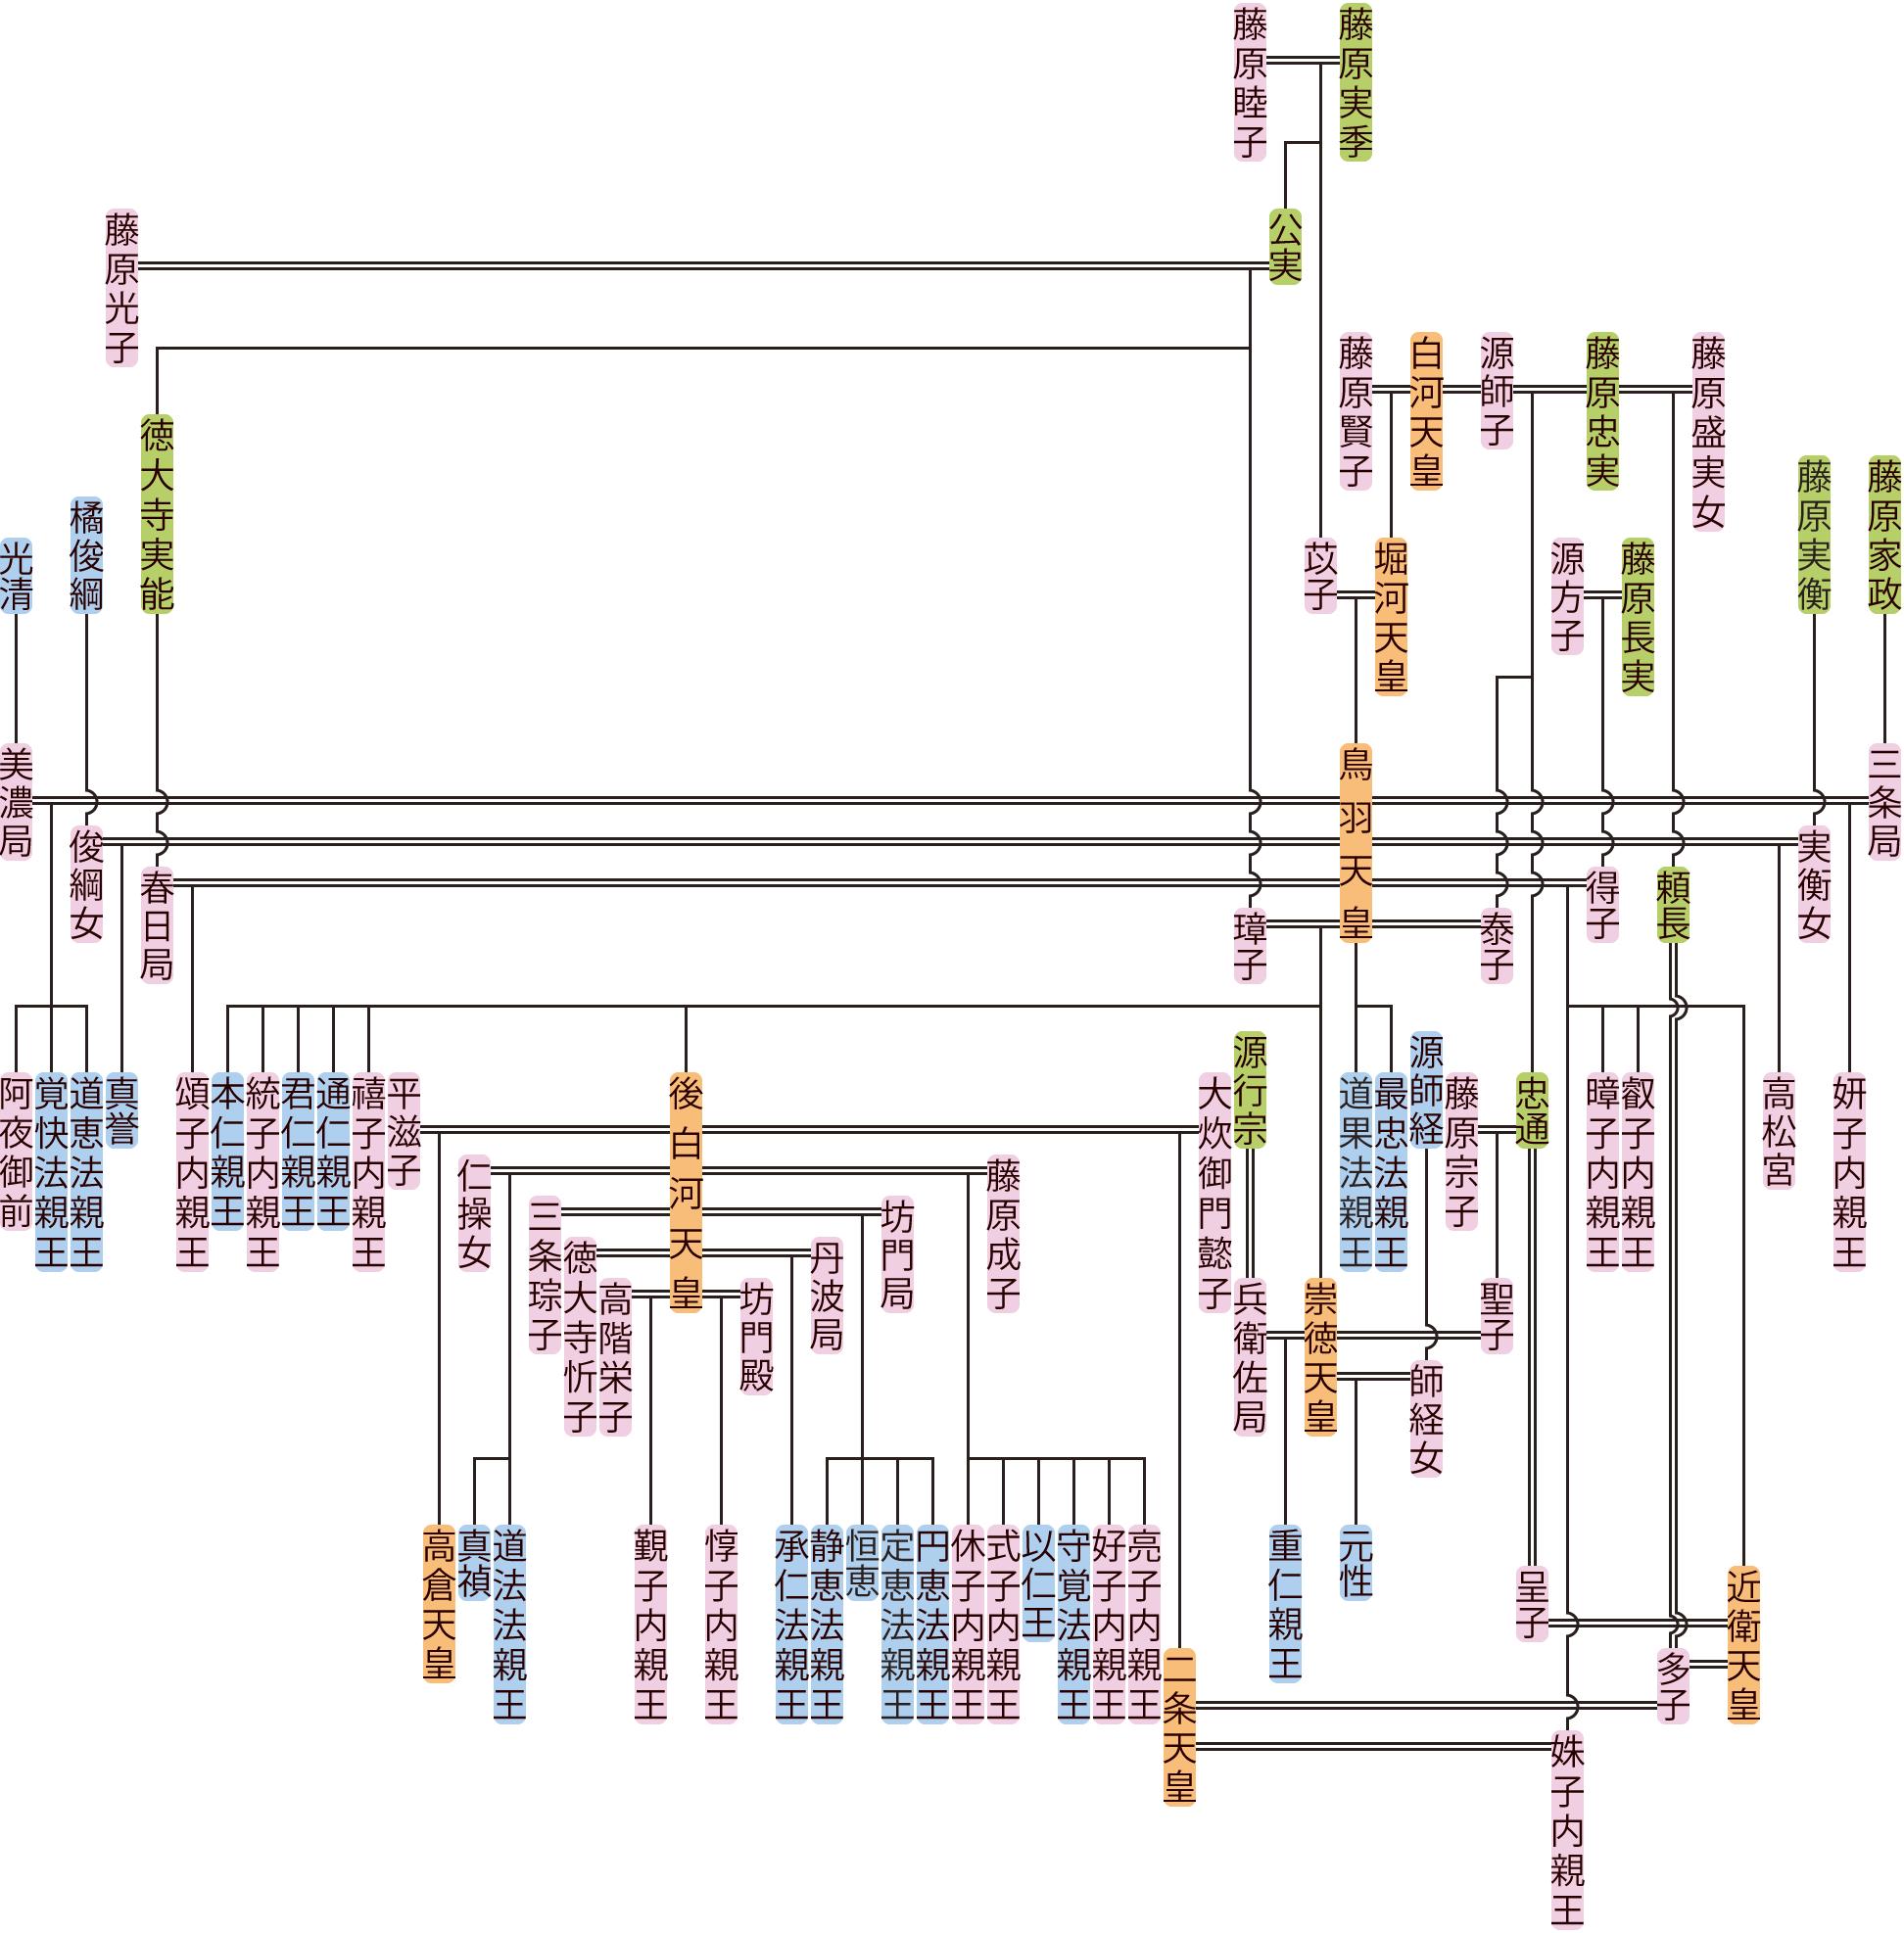 鳥羽天皇~近衛天皇の系図